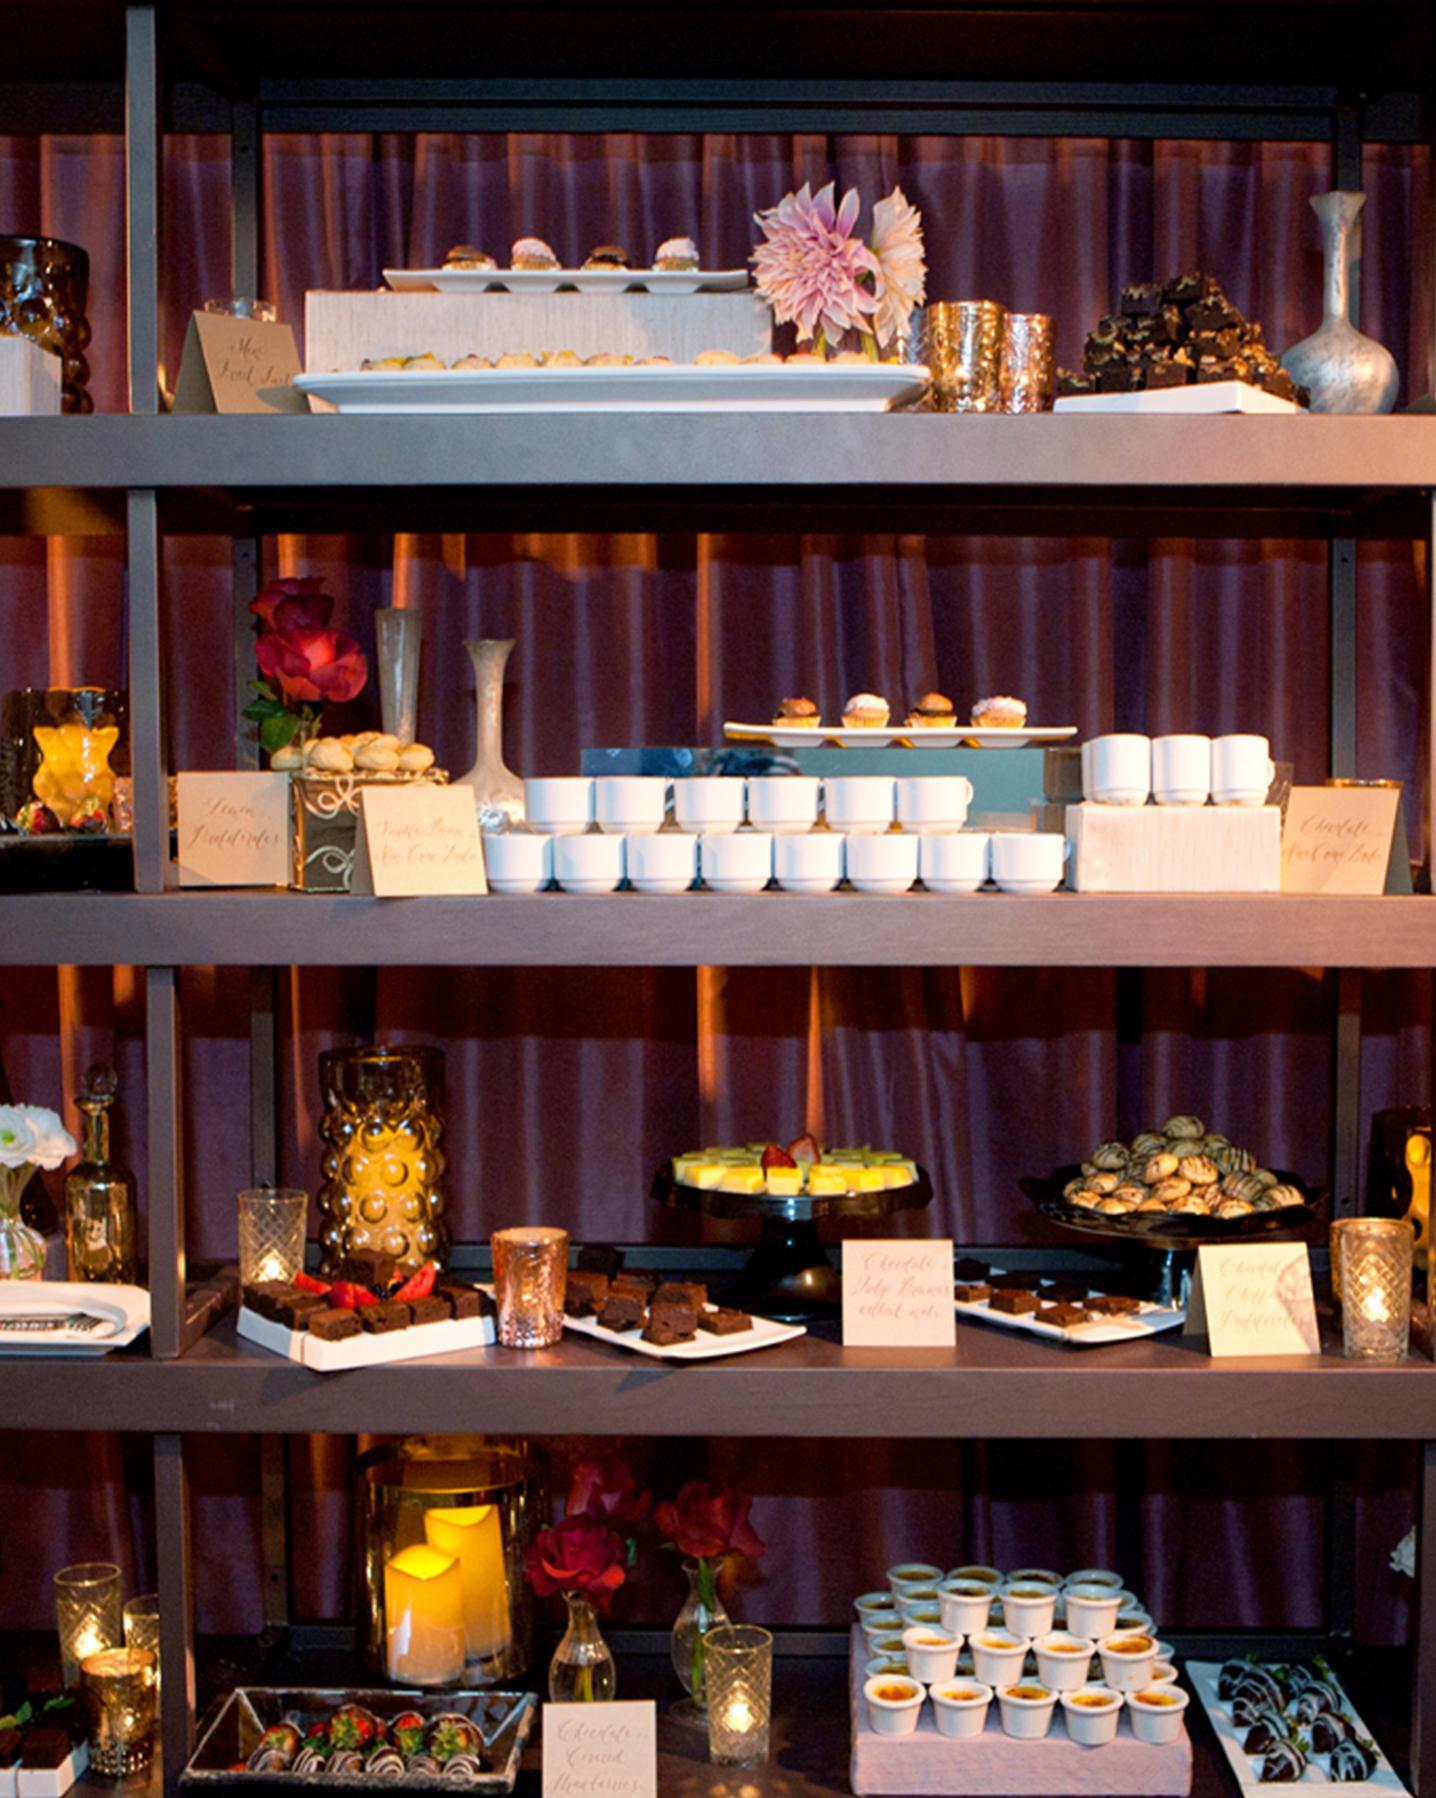 kristin-banta-dessert-bar-0515